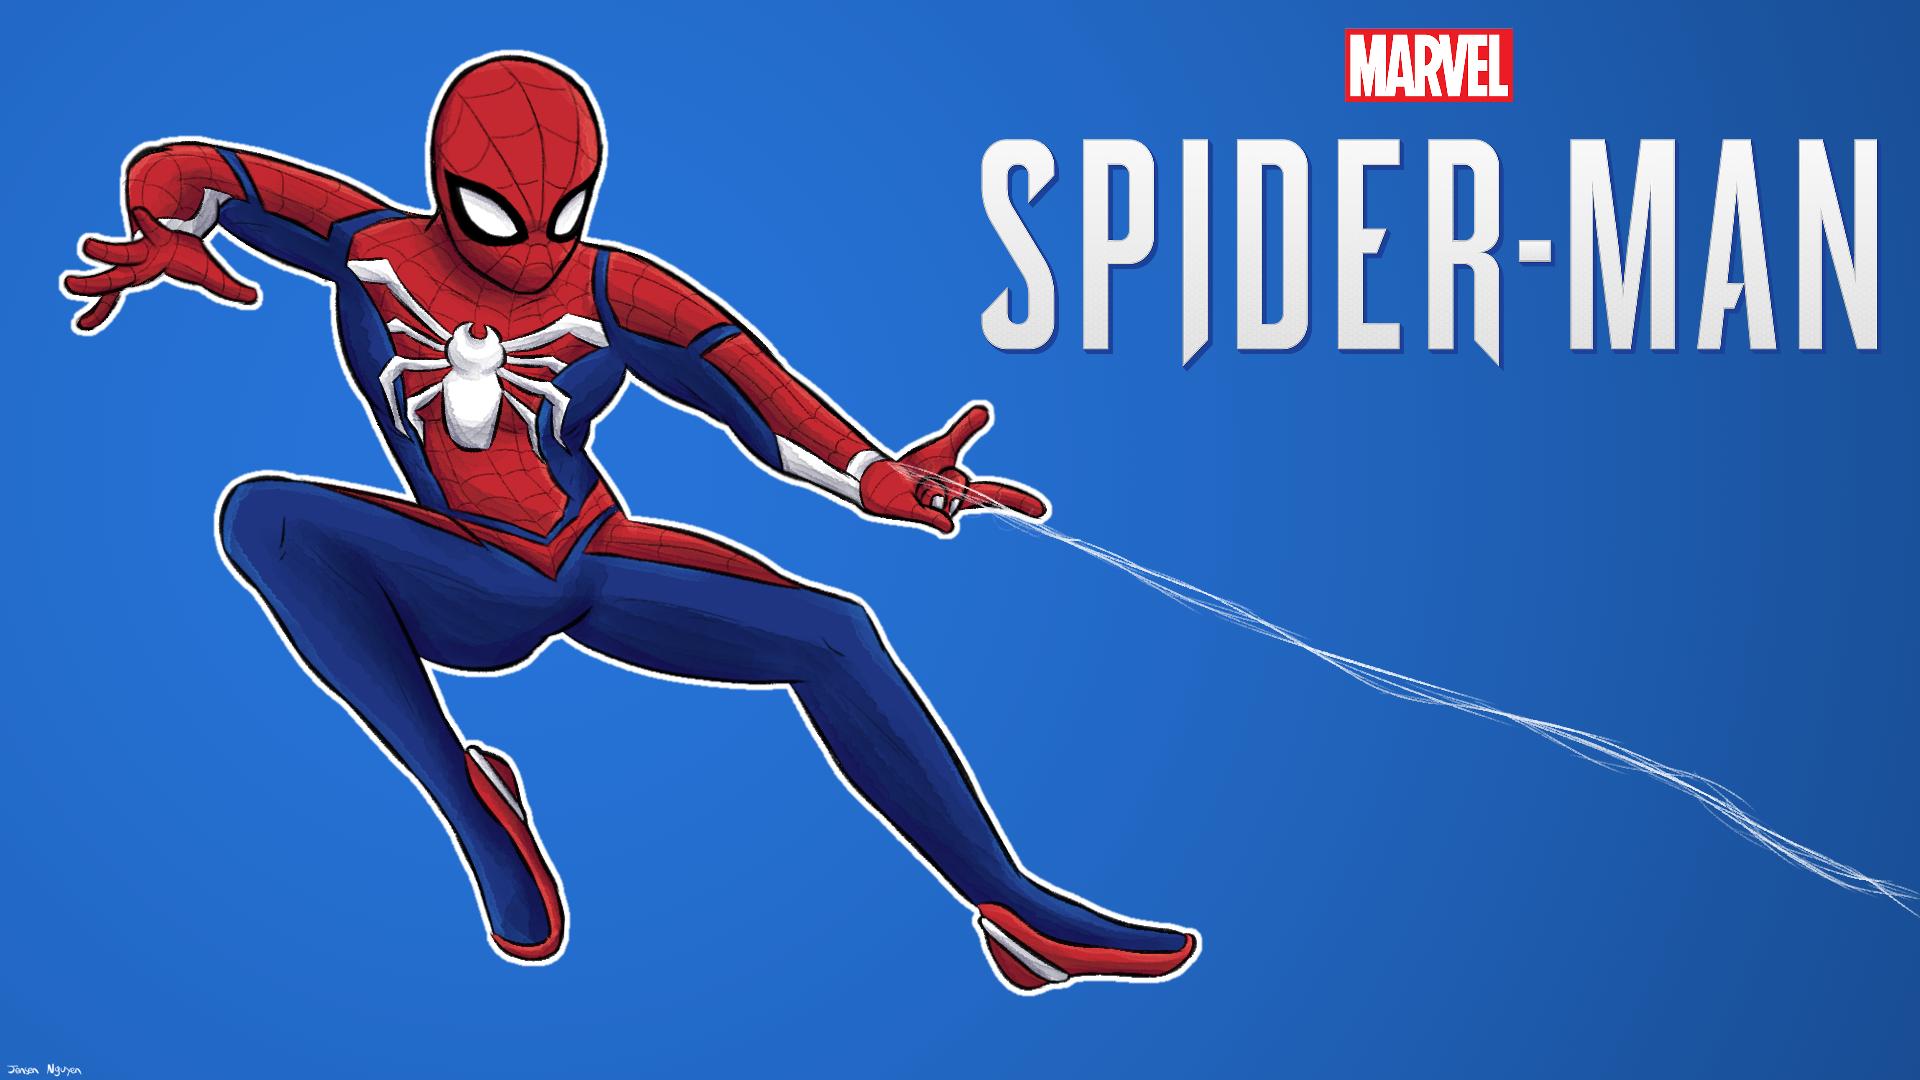 Marvel Spider Man Ps4 Wallpaper By 4bitscomic On Deviantart